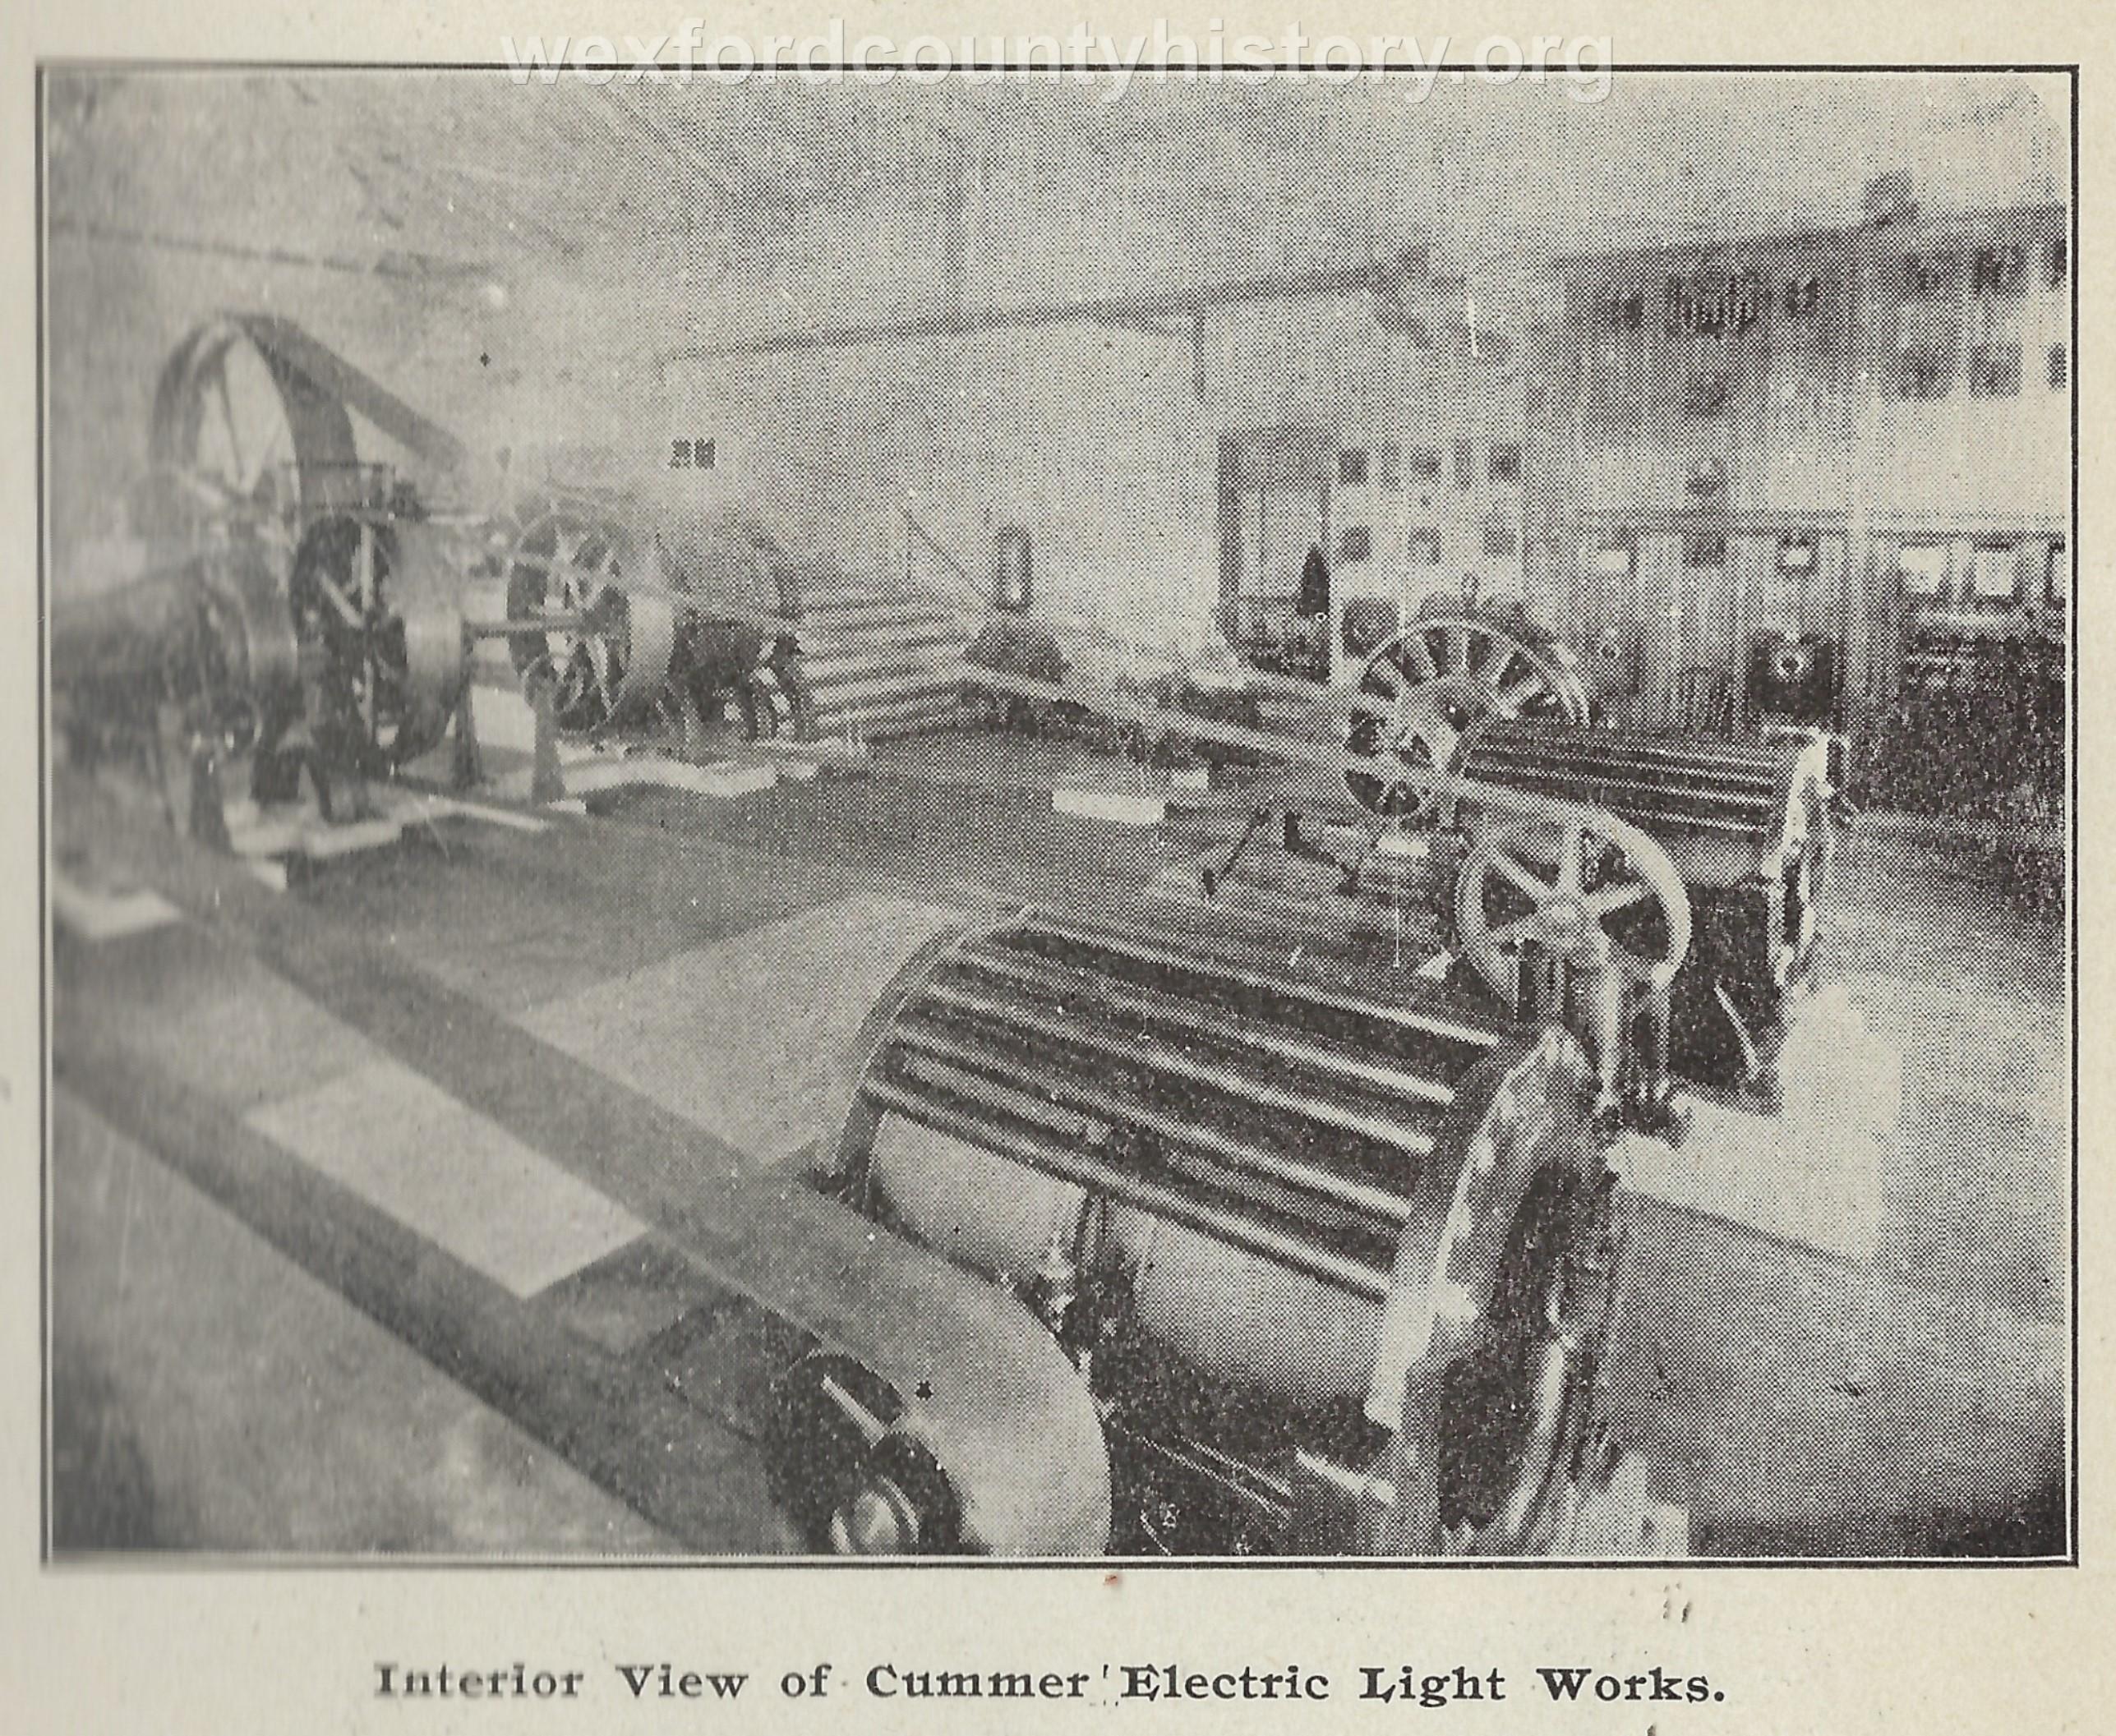 Cummer Electric Light Works